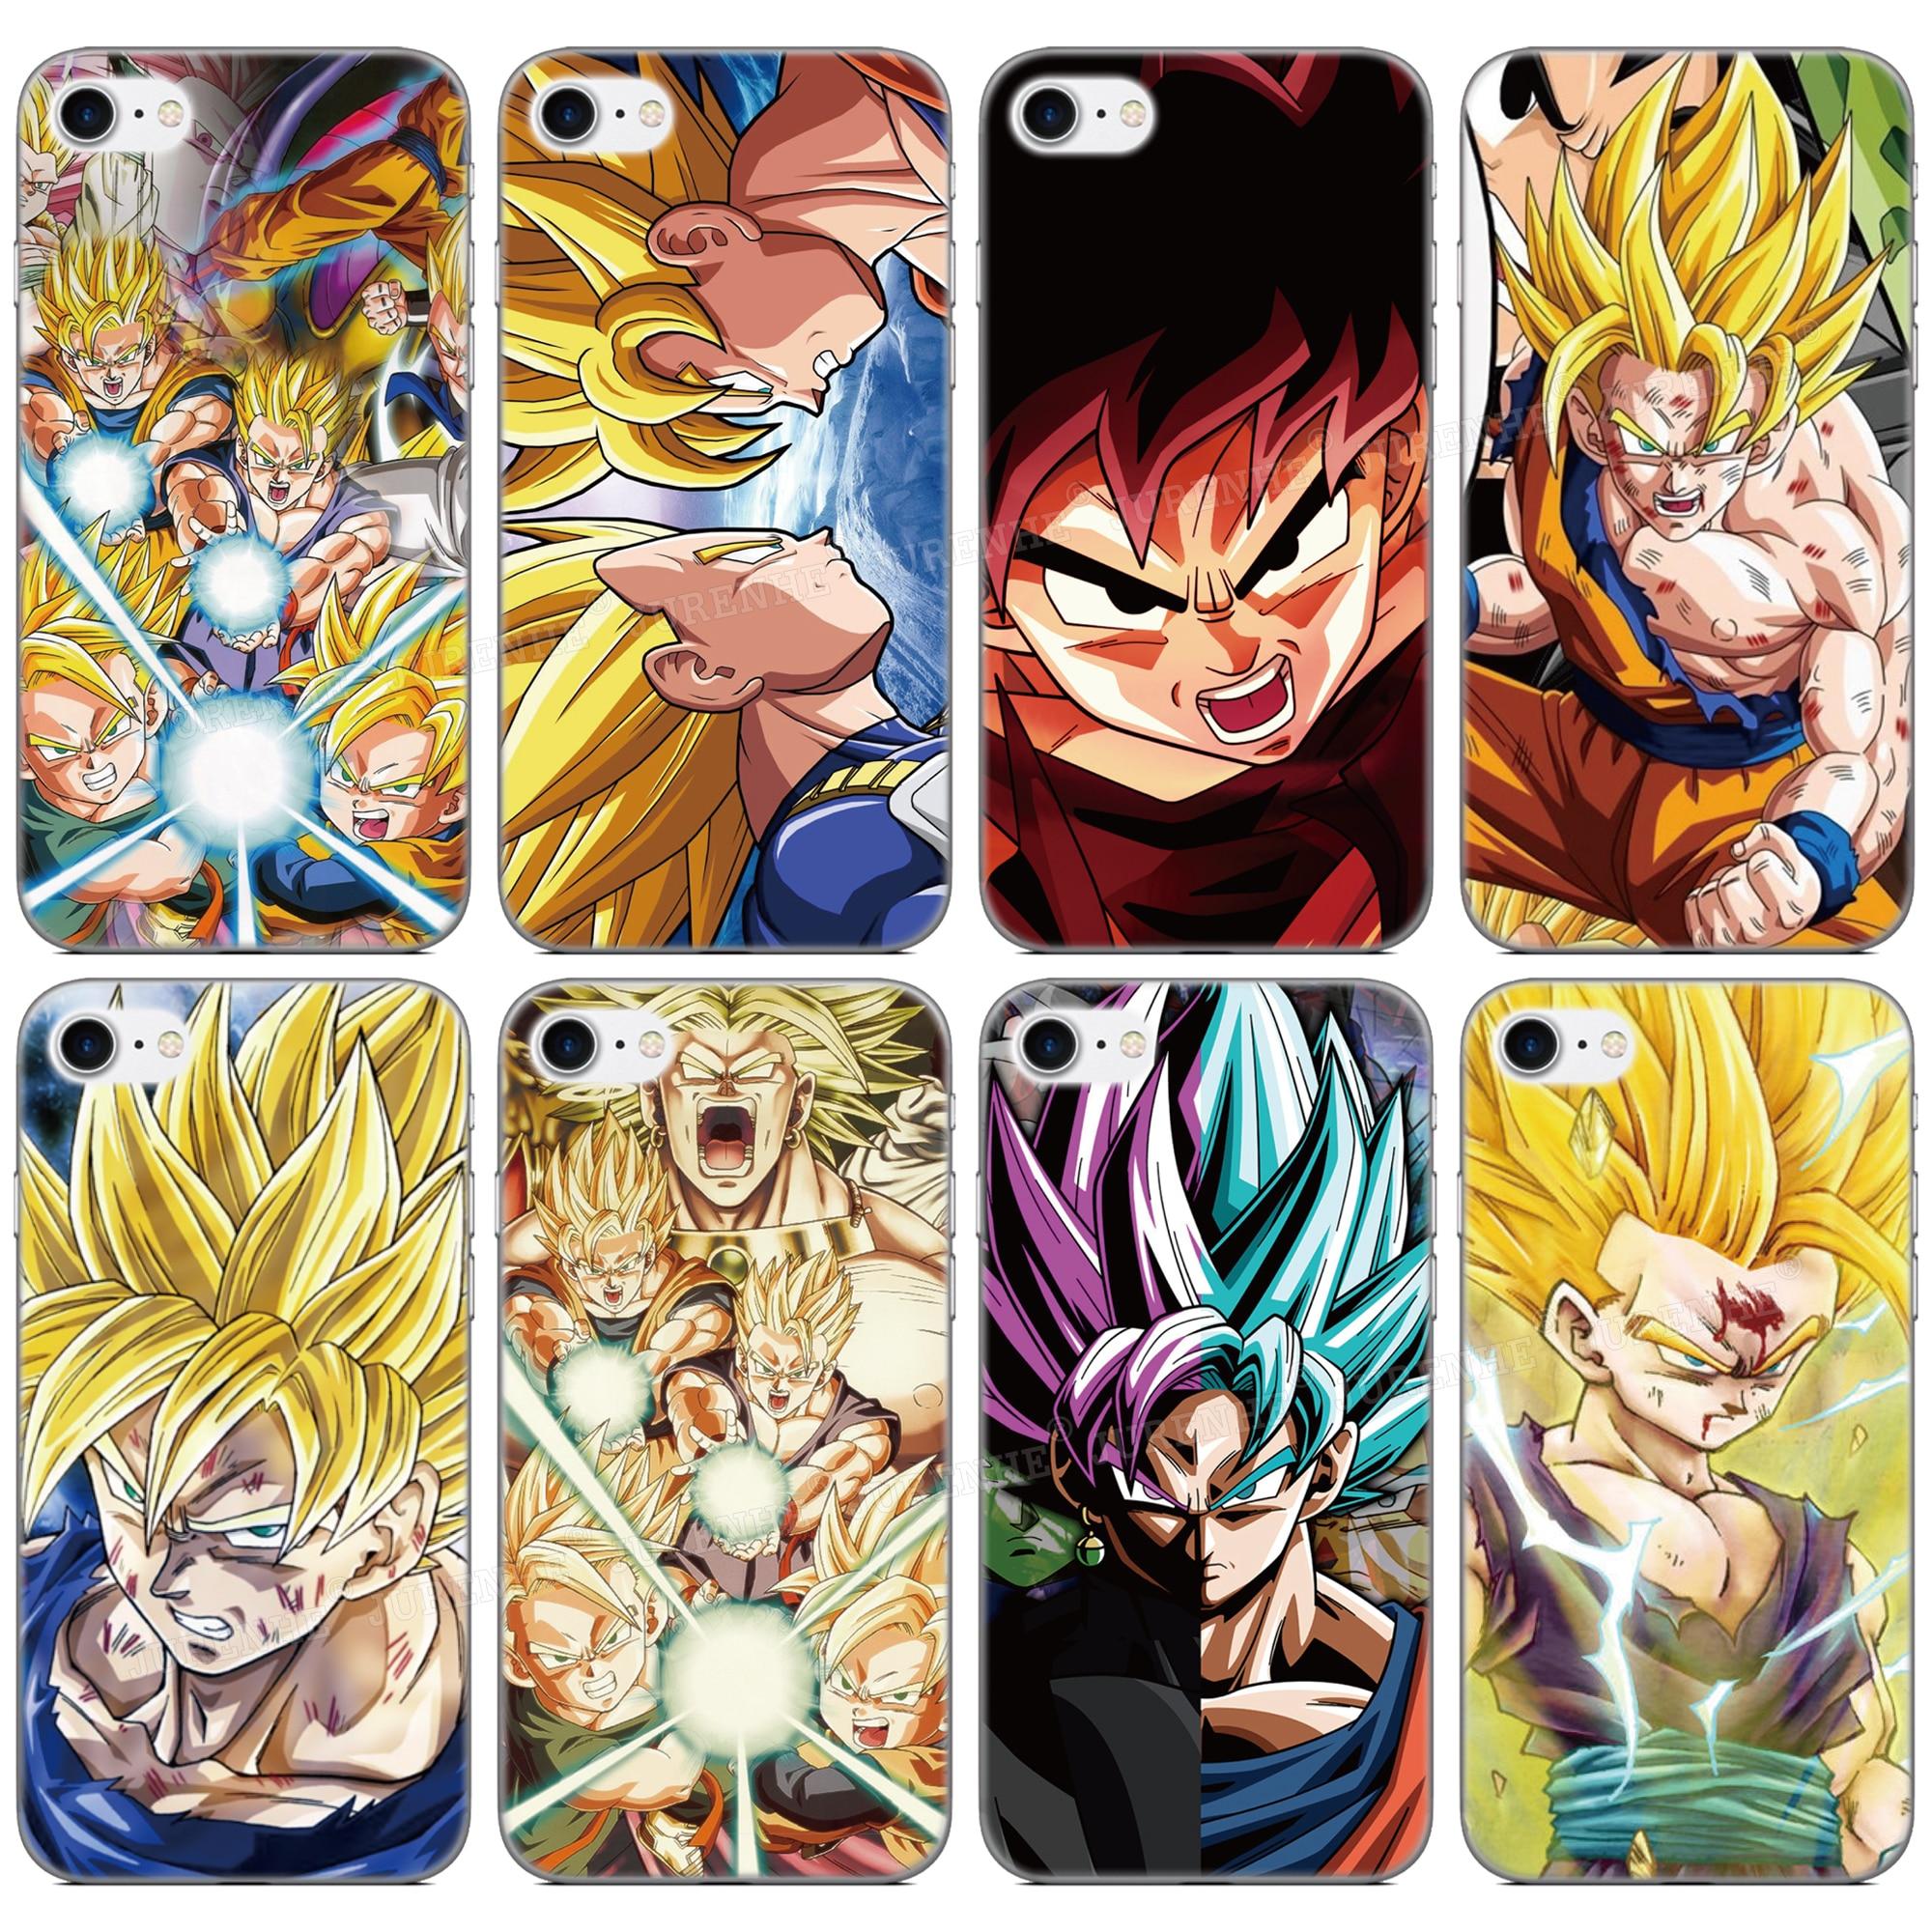 TPU Soft Silicone Dragon Ball Z Goku Phone Case For Sharp-Aquos R5G S2 R R3 V Zero 2 R2 Compact S3 High Sense 3 Lite Plus Cover